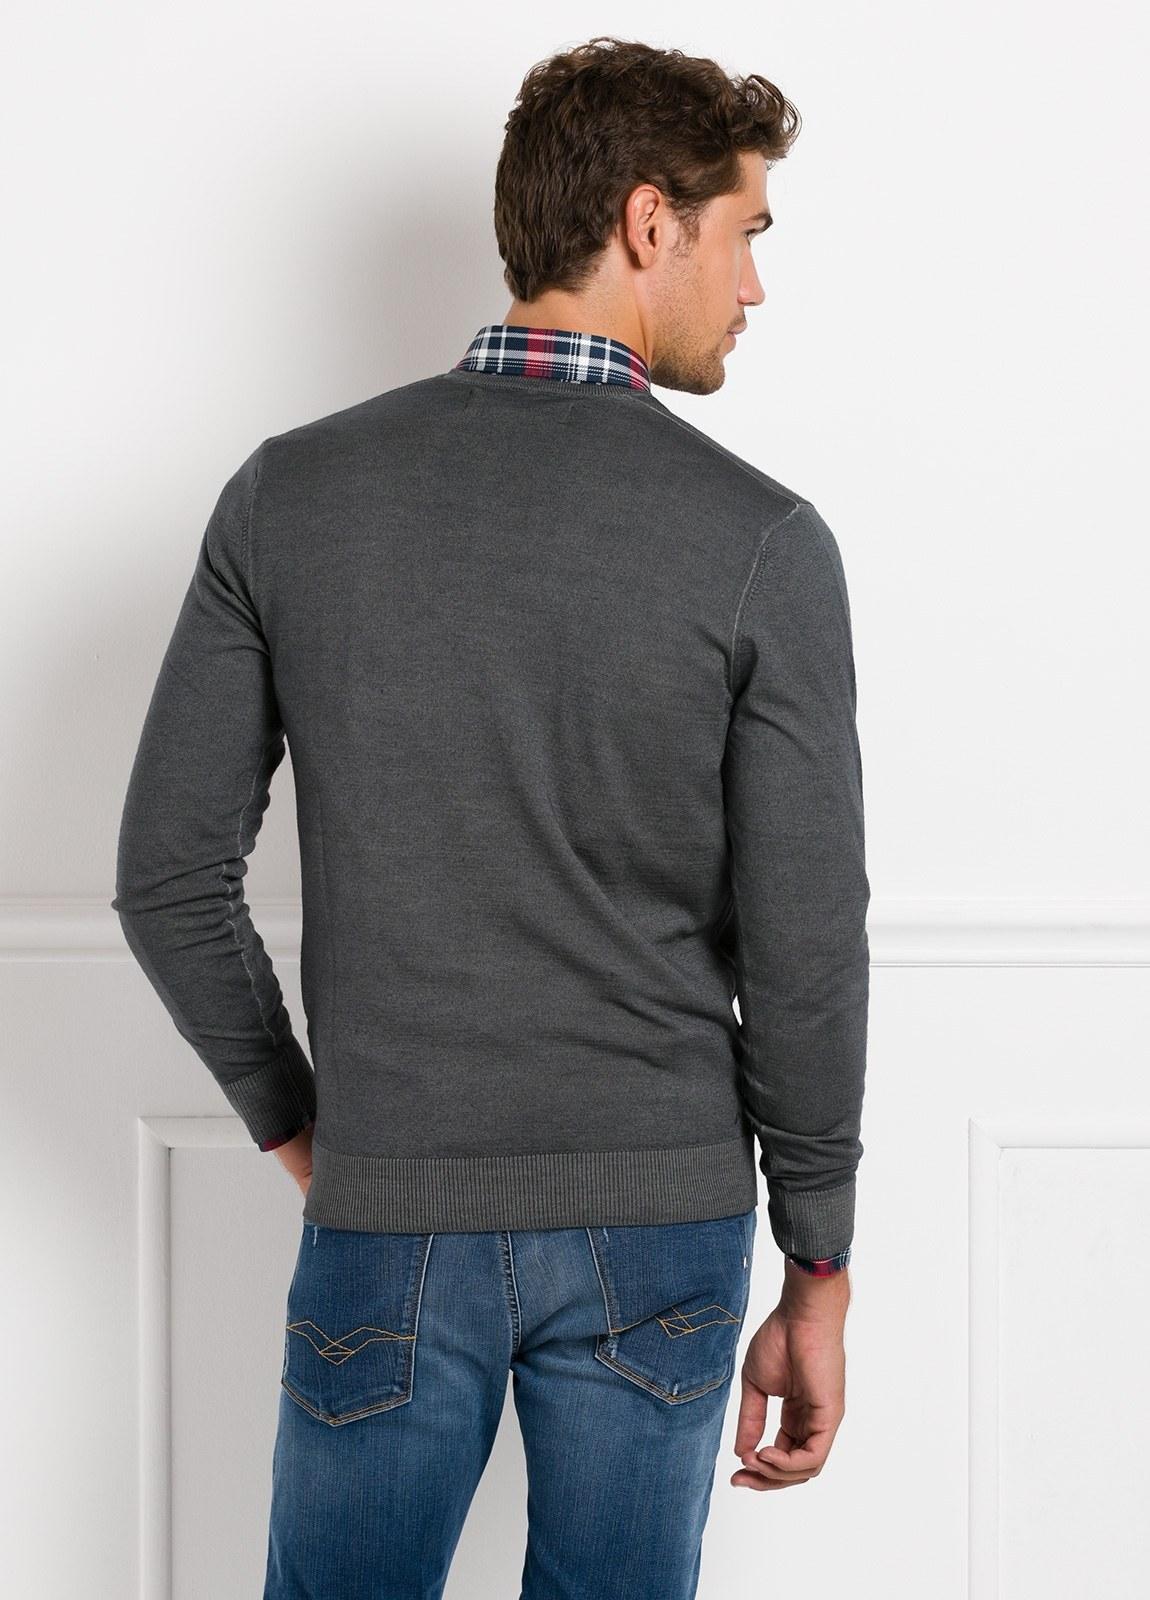 Suéter manga larga, cuello pico, color gris. 100% Lana. - Ítem1